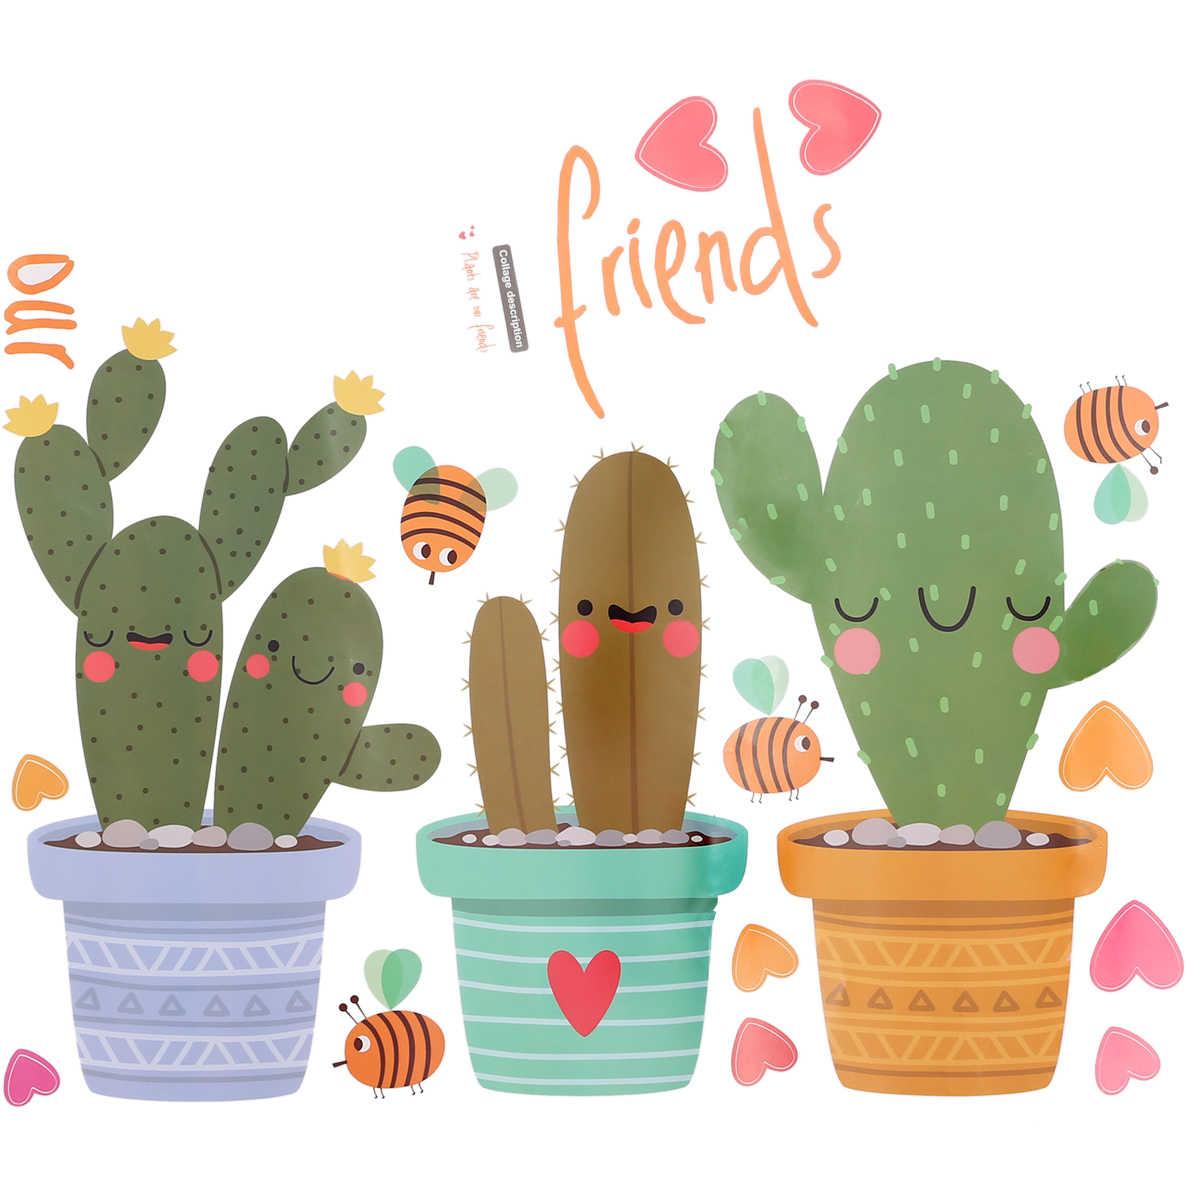 Gambar Kaktus Kartun Lucu - HD Wallpaper